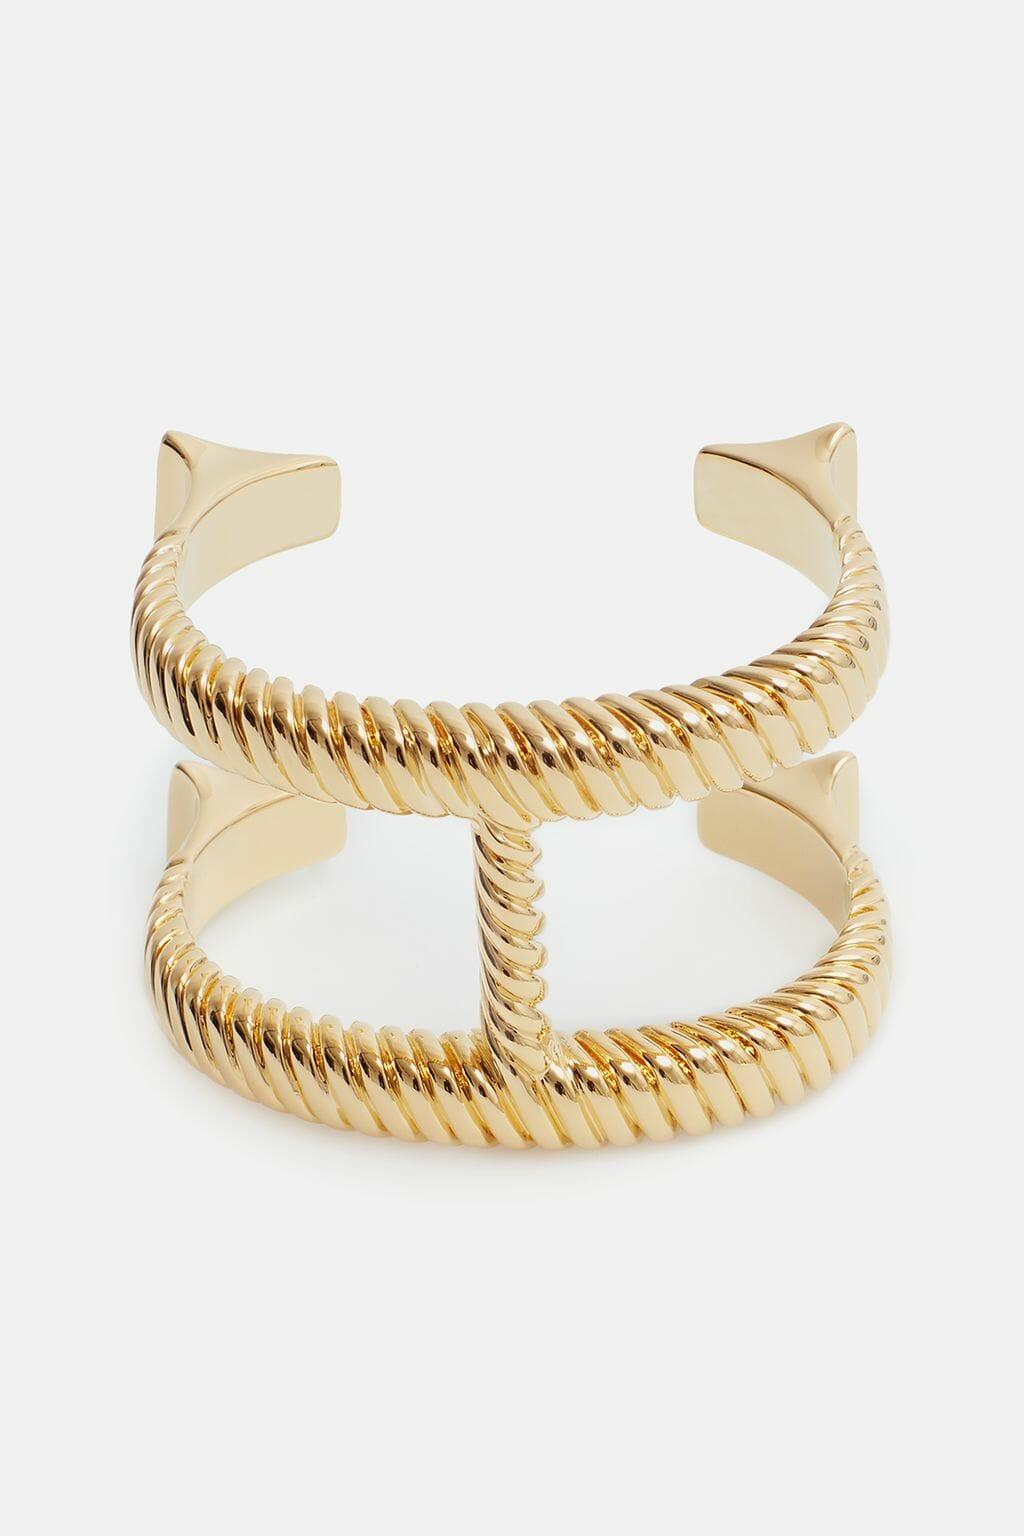 CH-Carolina-herrera-insignia-jewelry-look-12